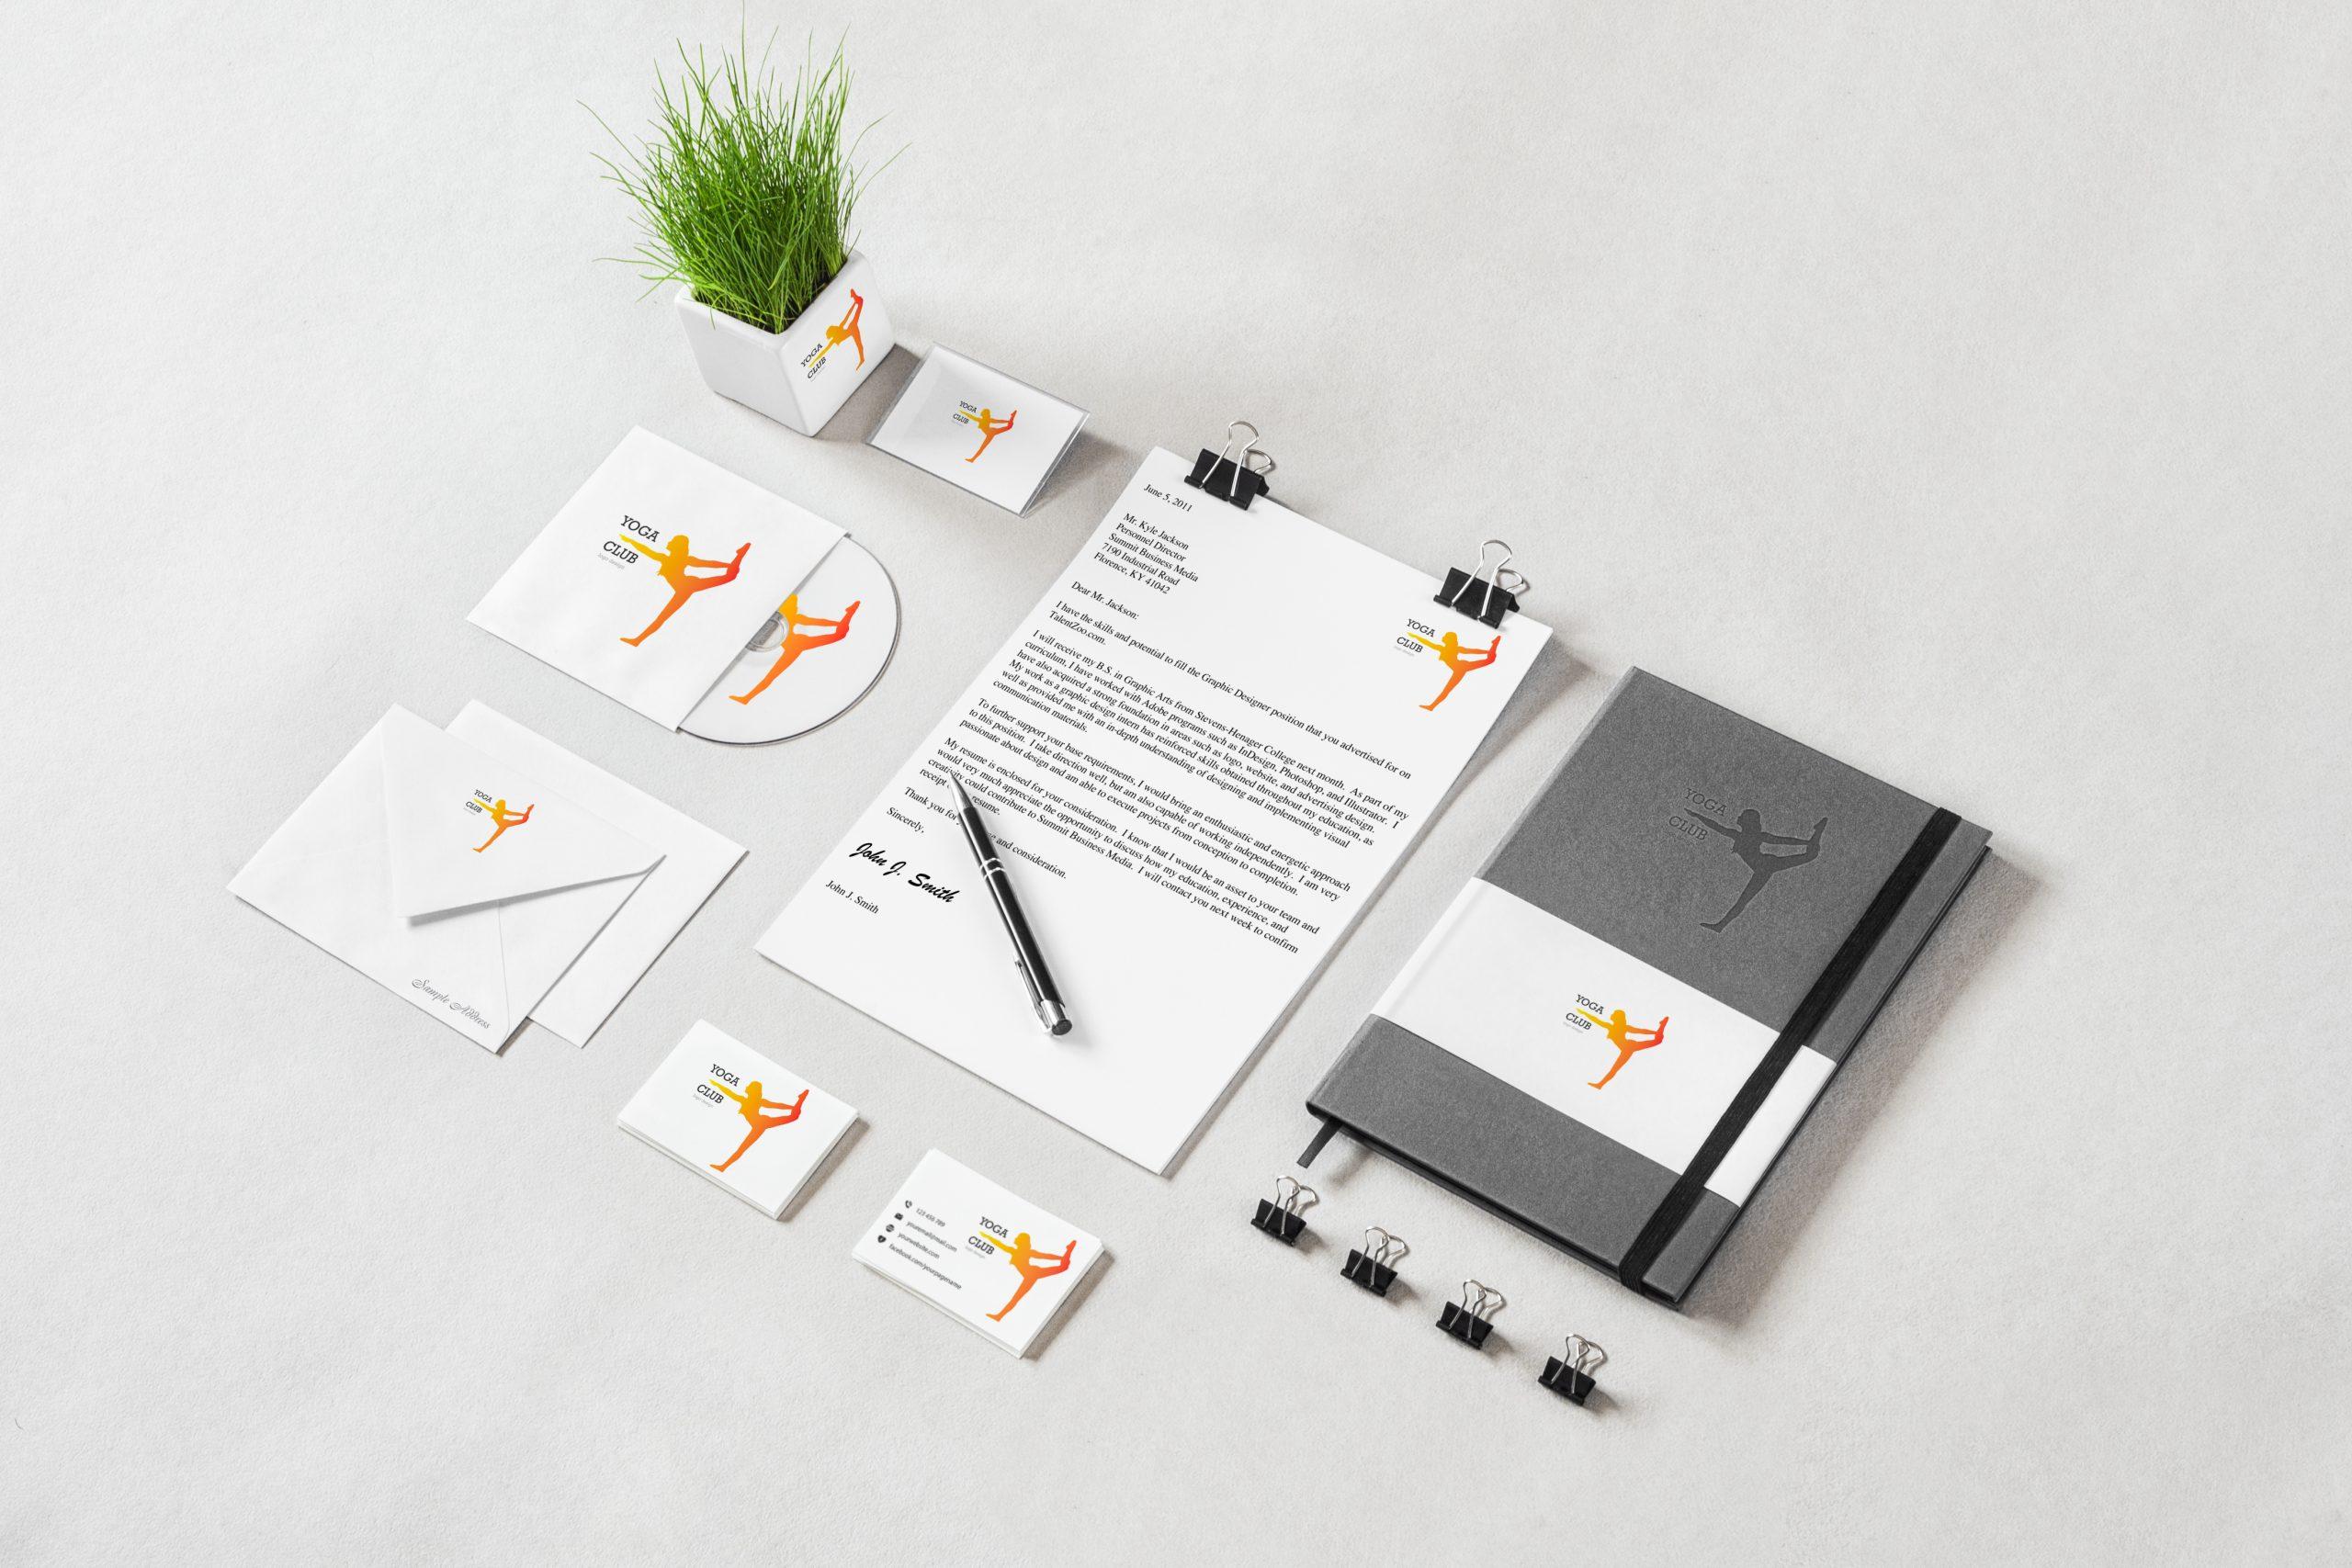 Yoga-Club-logo-design-branding-mockup-2-ayatemplates